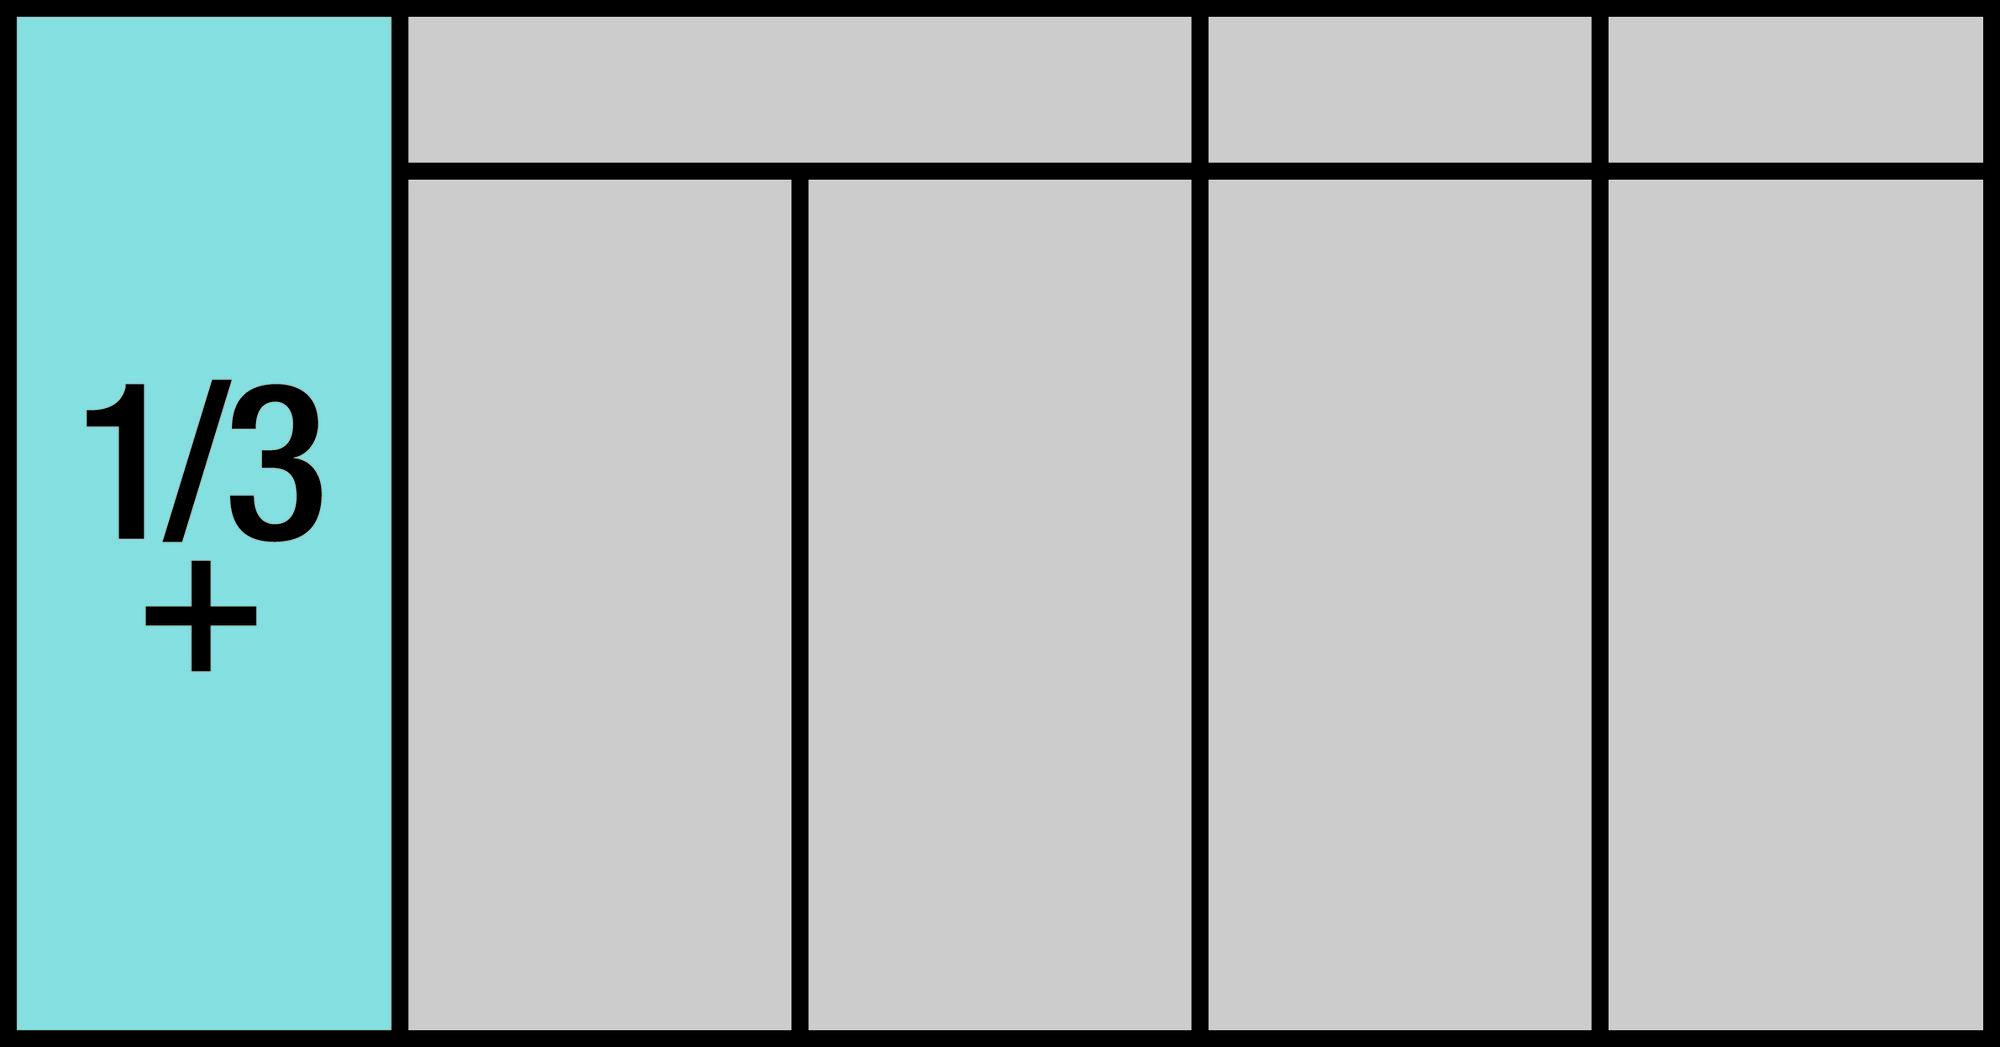 HAZET Elektronik-Schraubendreher Satz 163-517/15 ∙ Schlitz Profil, Kreuzschlitz Profil PH, Innen TORX® Profil